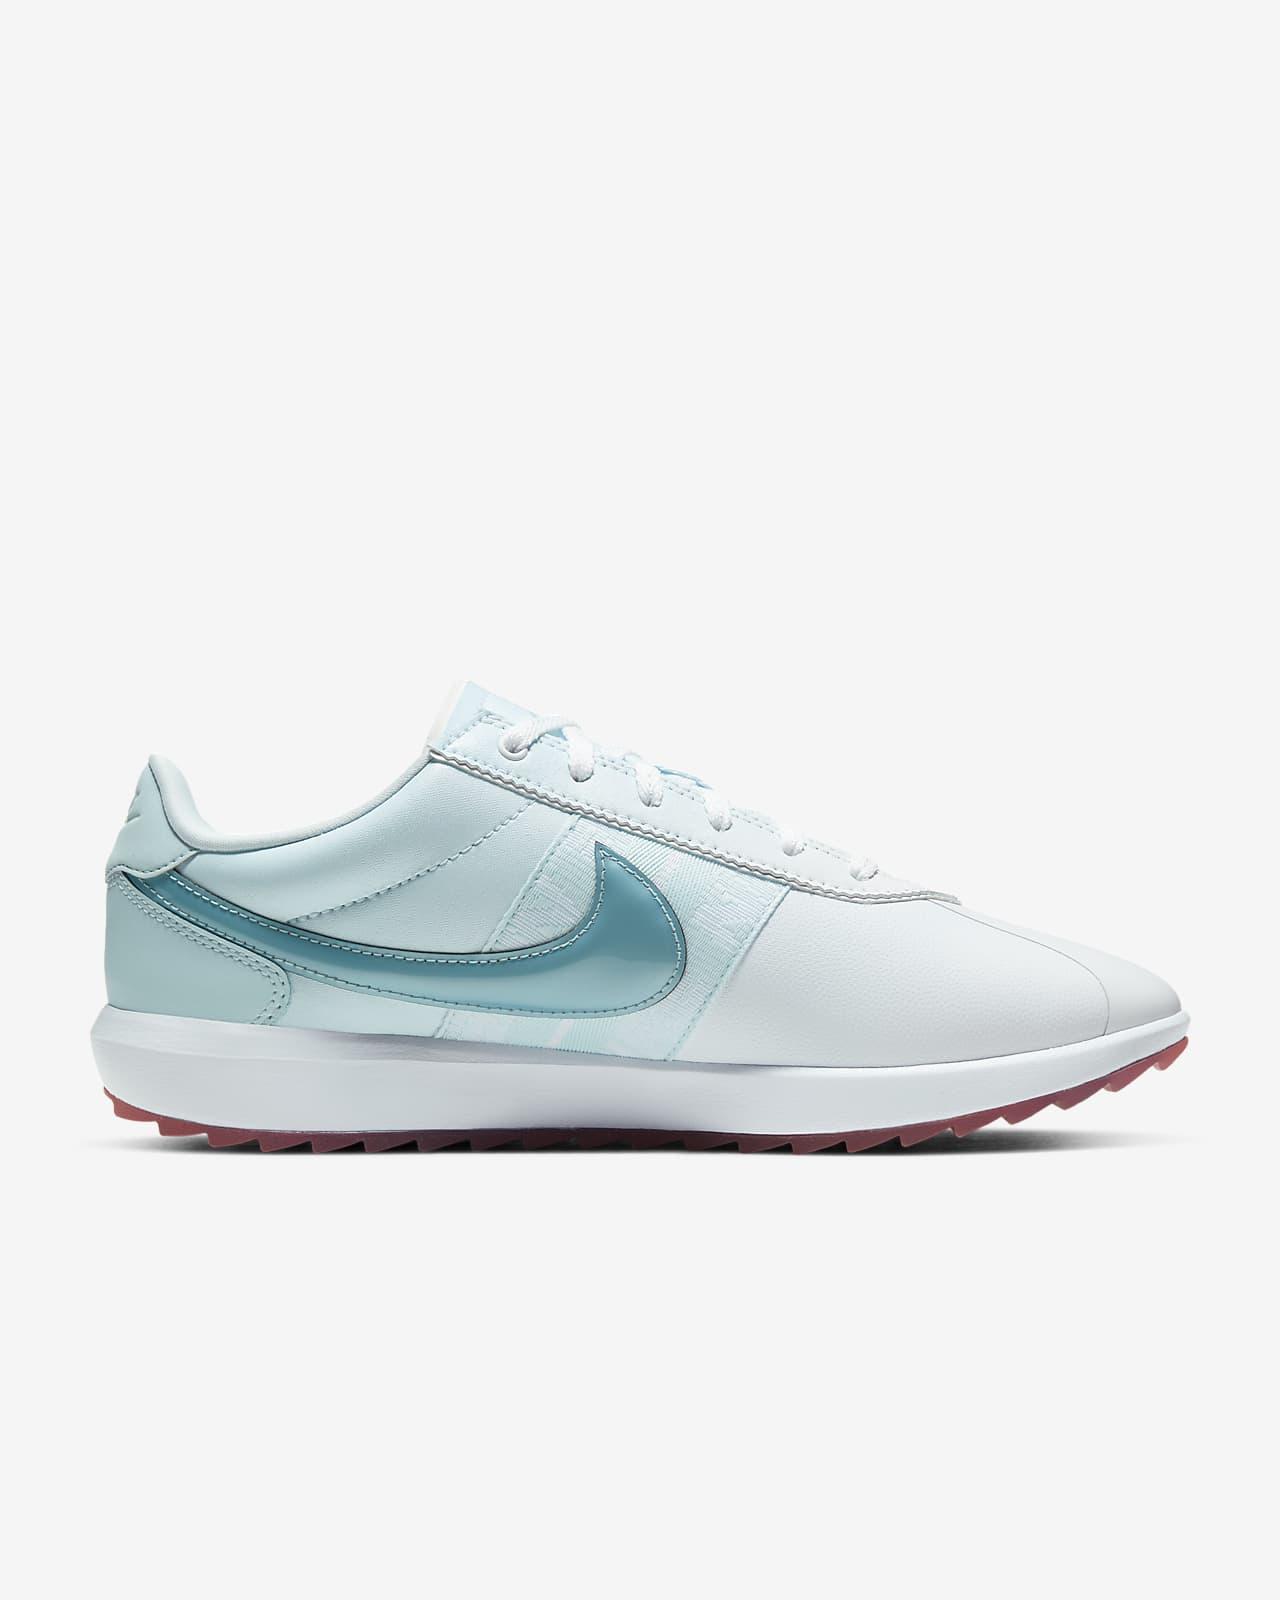 Nike Cortez G NRG Women's Golf Shoe